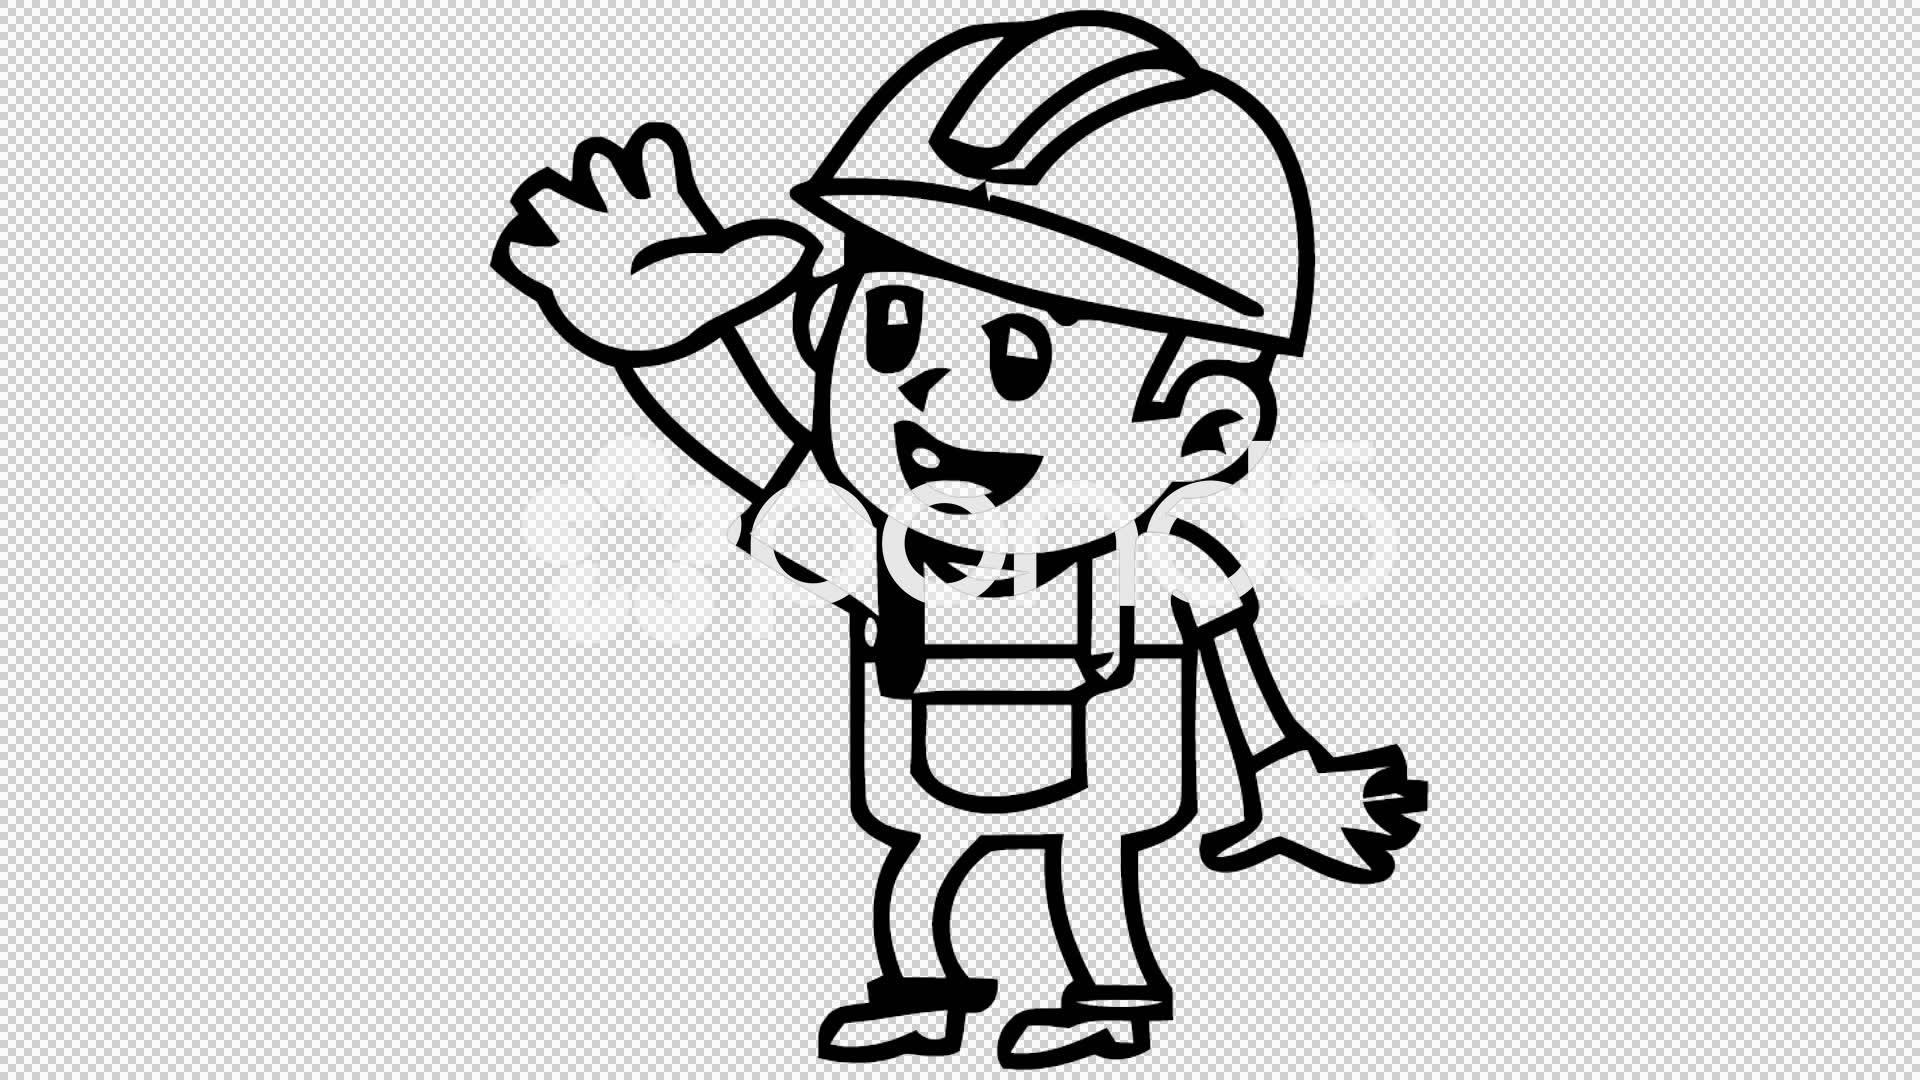 1920x1080 Video Man Waving Hand Cartoon Illustration Hand Drawn Animation